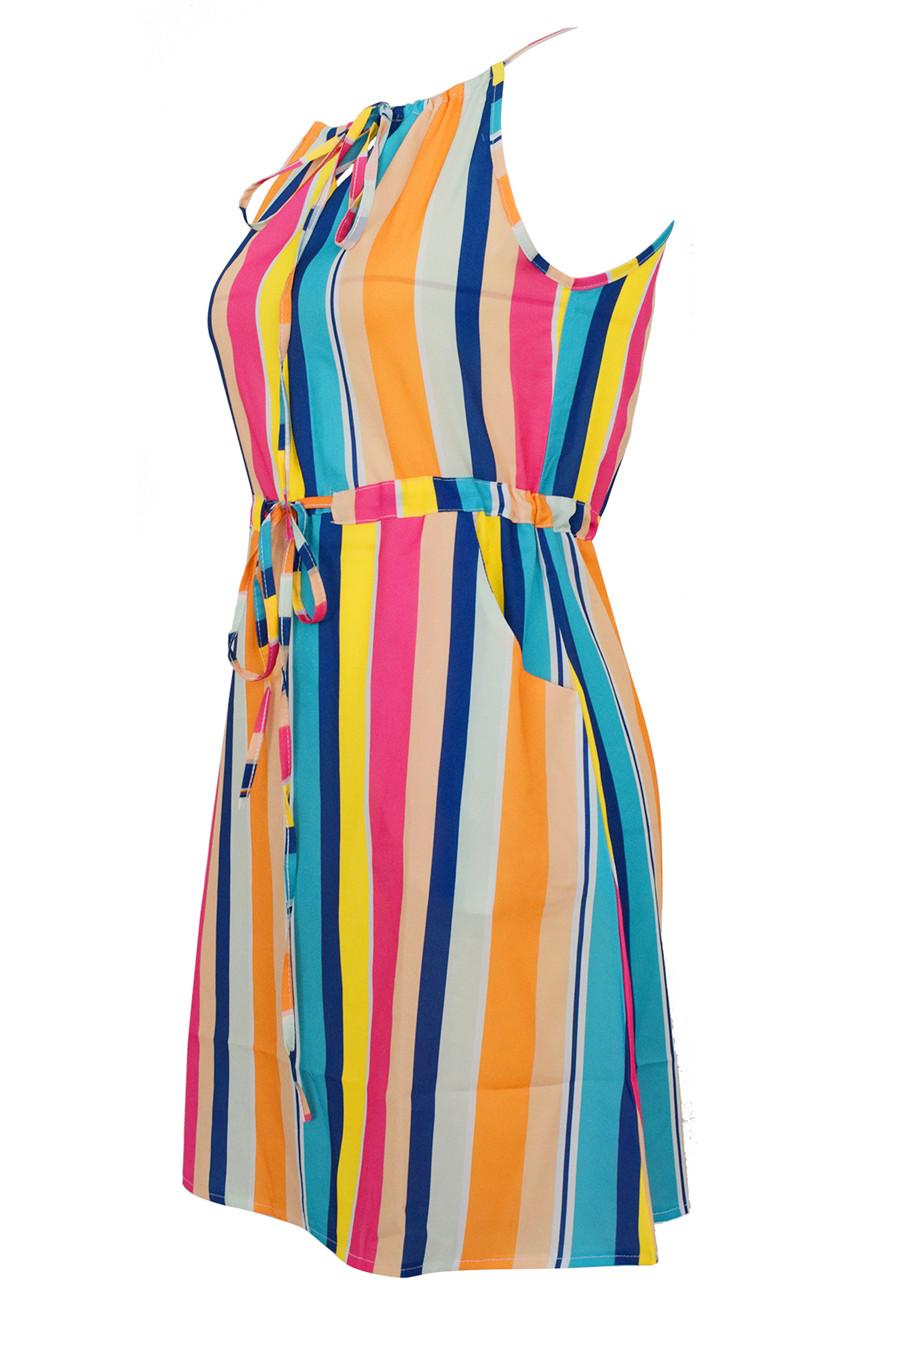 Gladiolus Chiffon Women Summer Dress Spaghetti Strap Floral Print Pocket Sexy Bohemian Beach Dress 2019 Short Ladies Dresses (26)